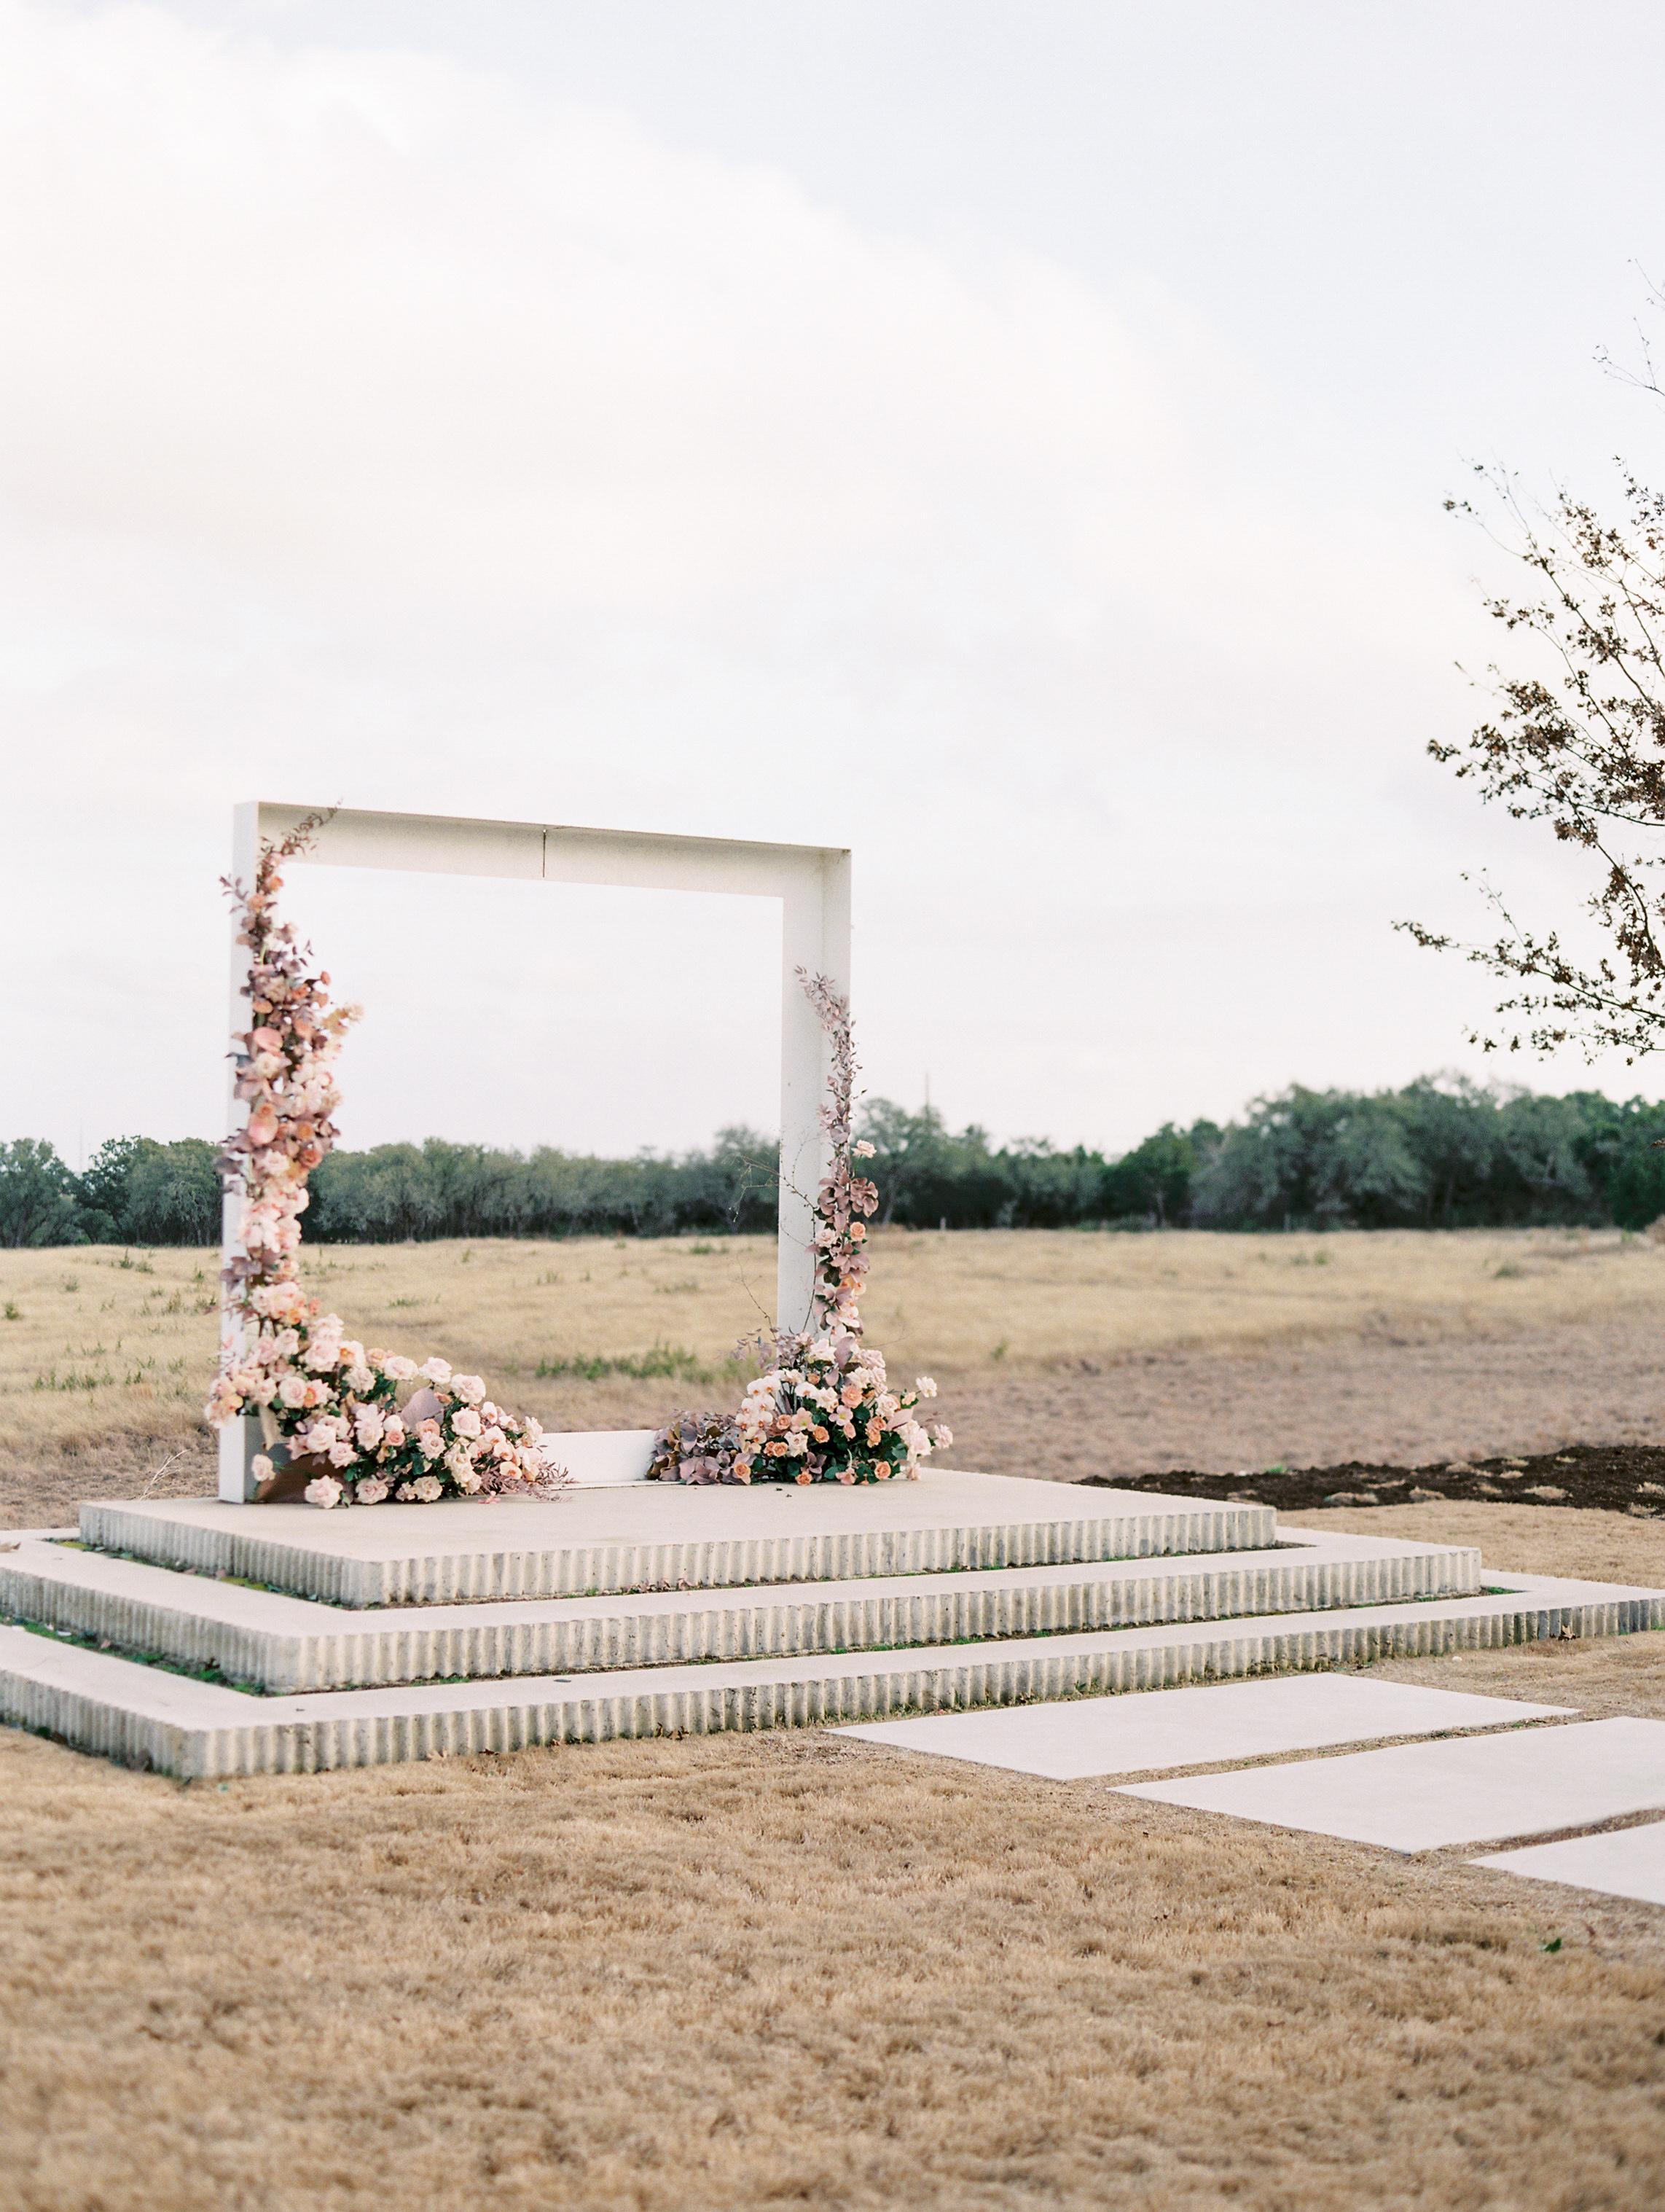 Austin-Wedding-Photography-Prospect-House-Fine-Art-Film-Destination-Dana-Josh-Fernandez-Photography-Dallas-Houston-Luxury-Best-Top-9.jpg